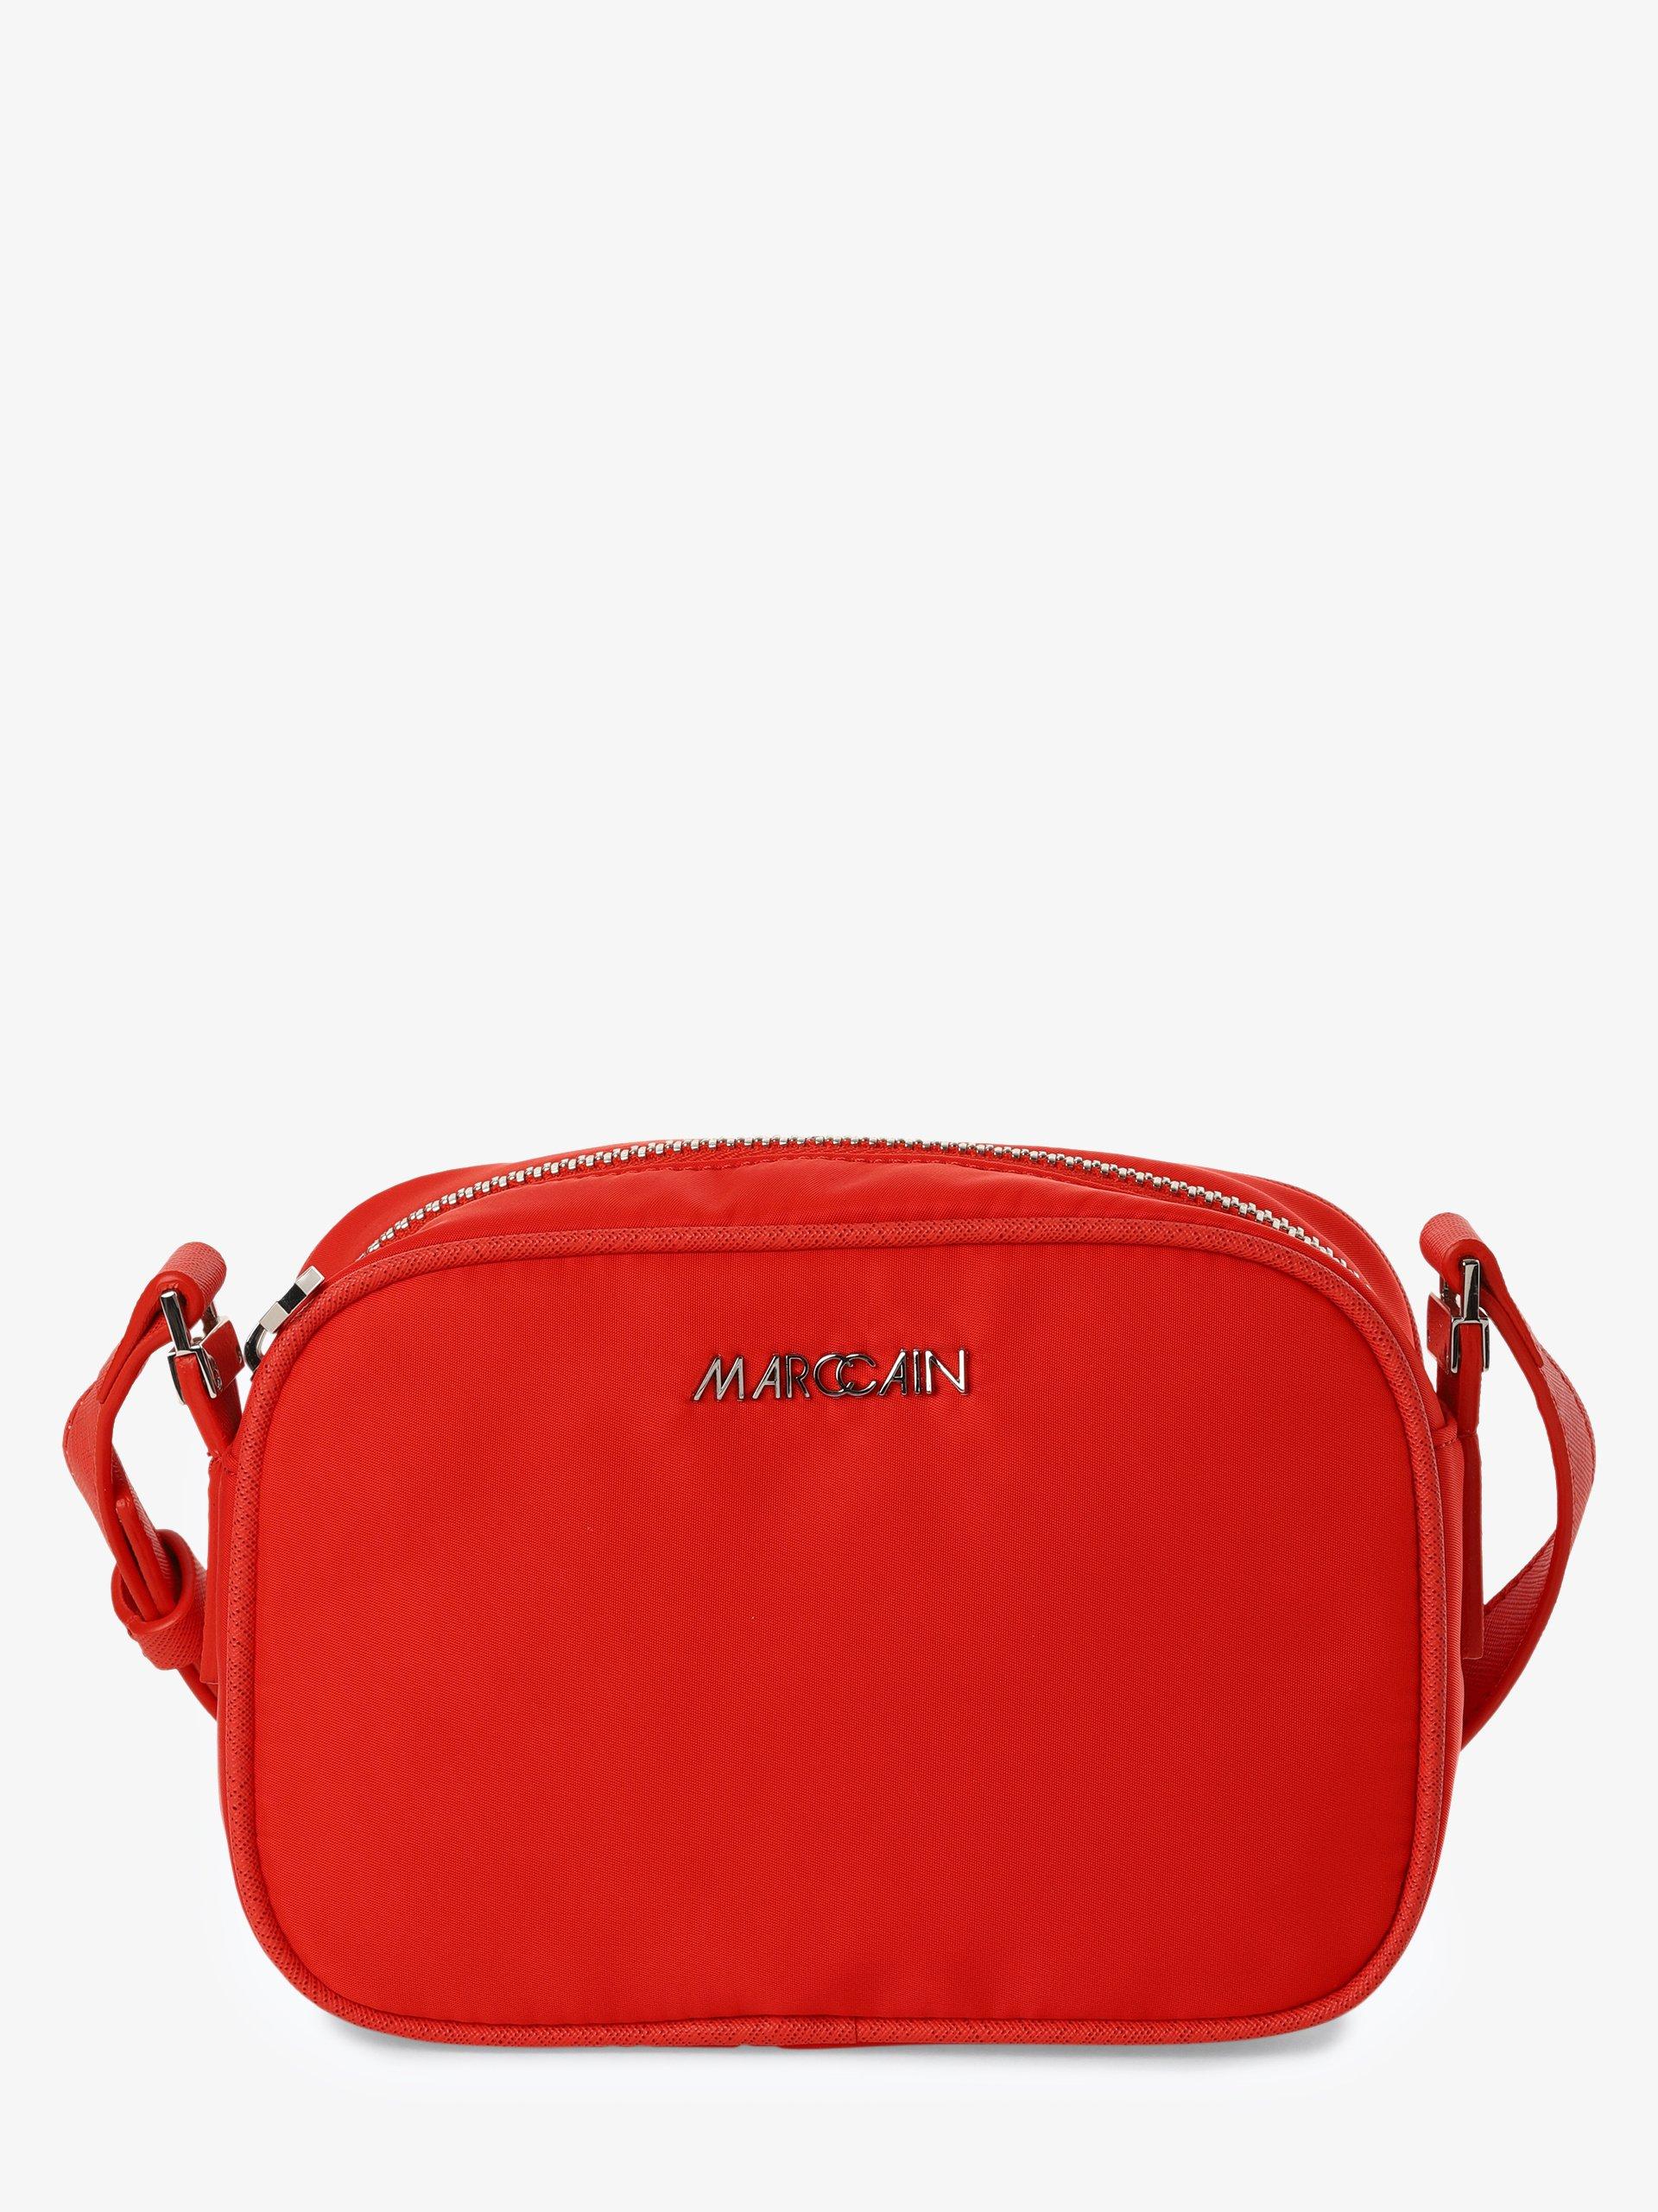 Marc Cain Bags & Shoes Damen Handtasche